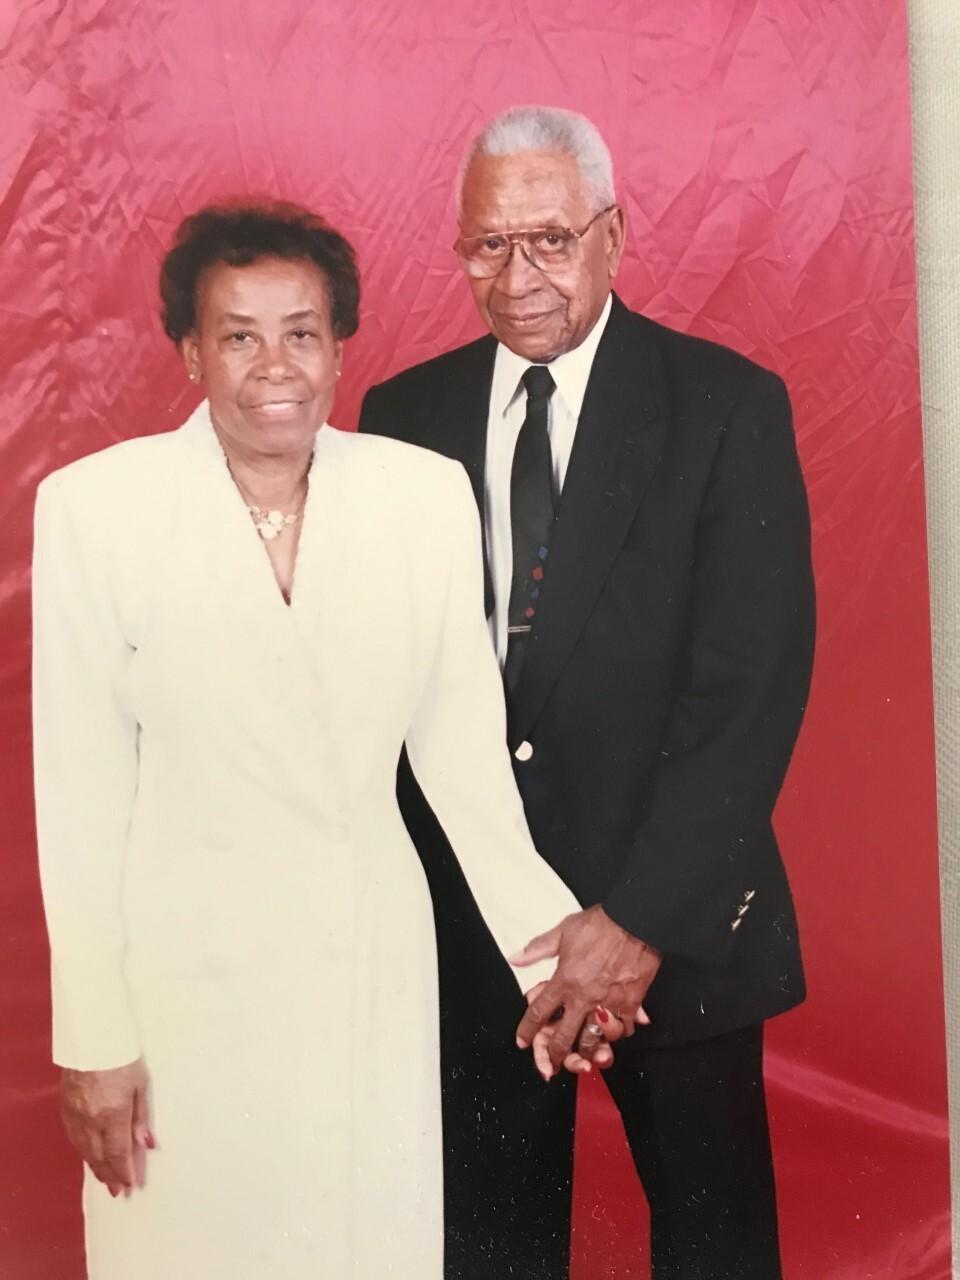 Alonzo and Theresa Robinson